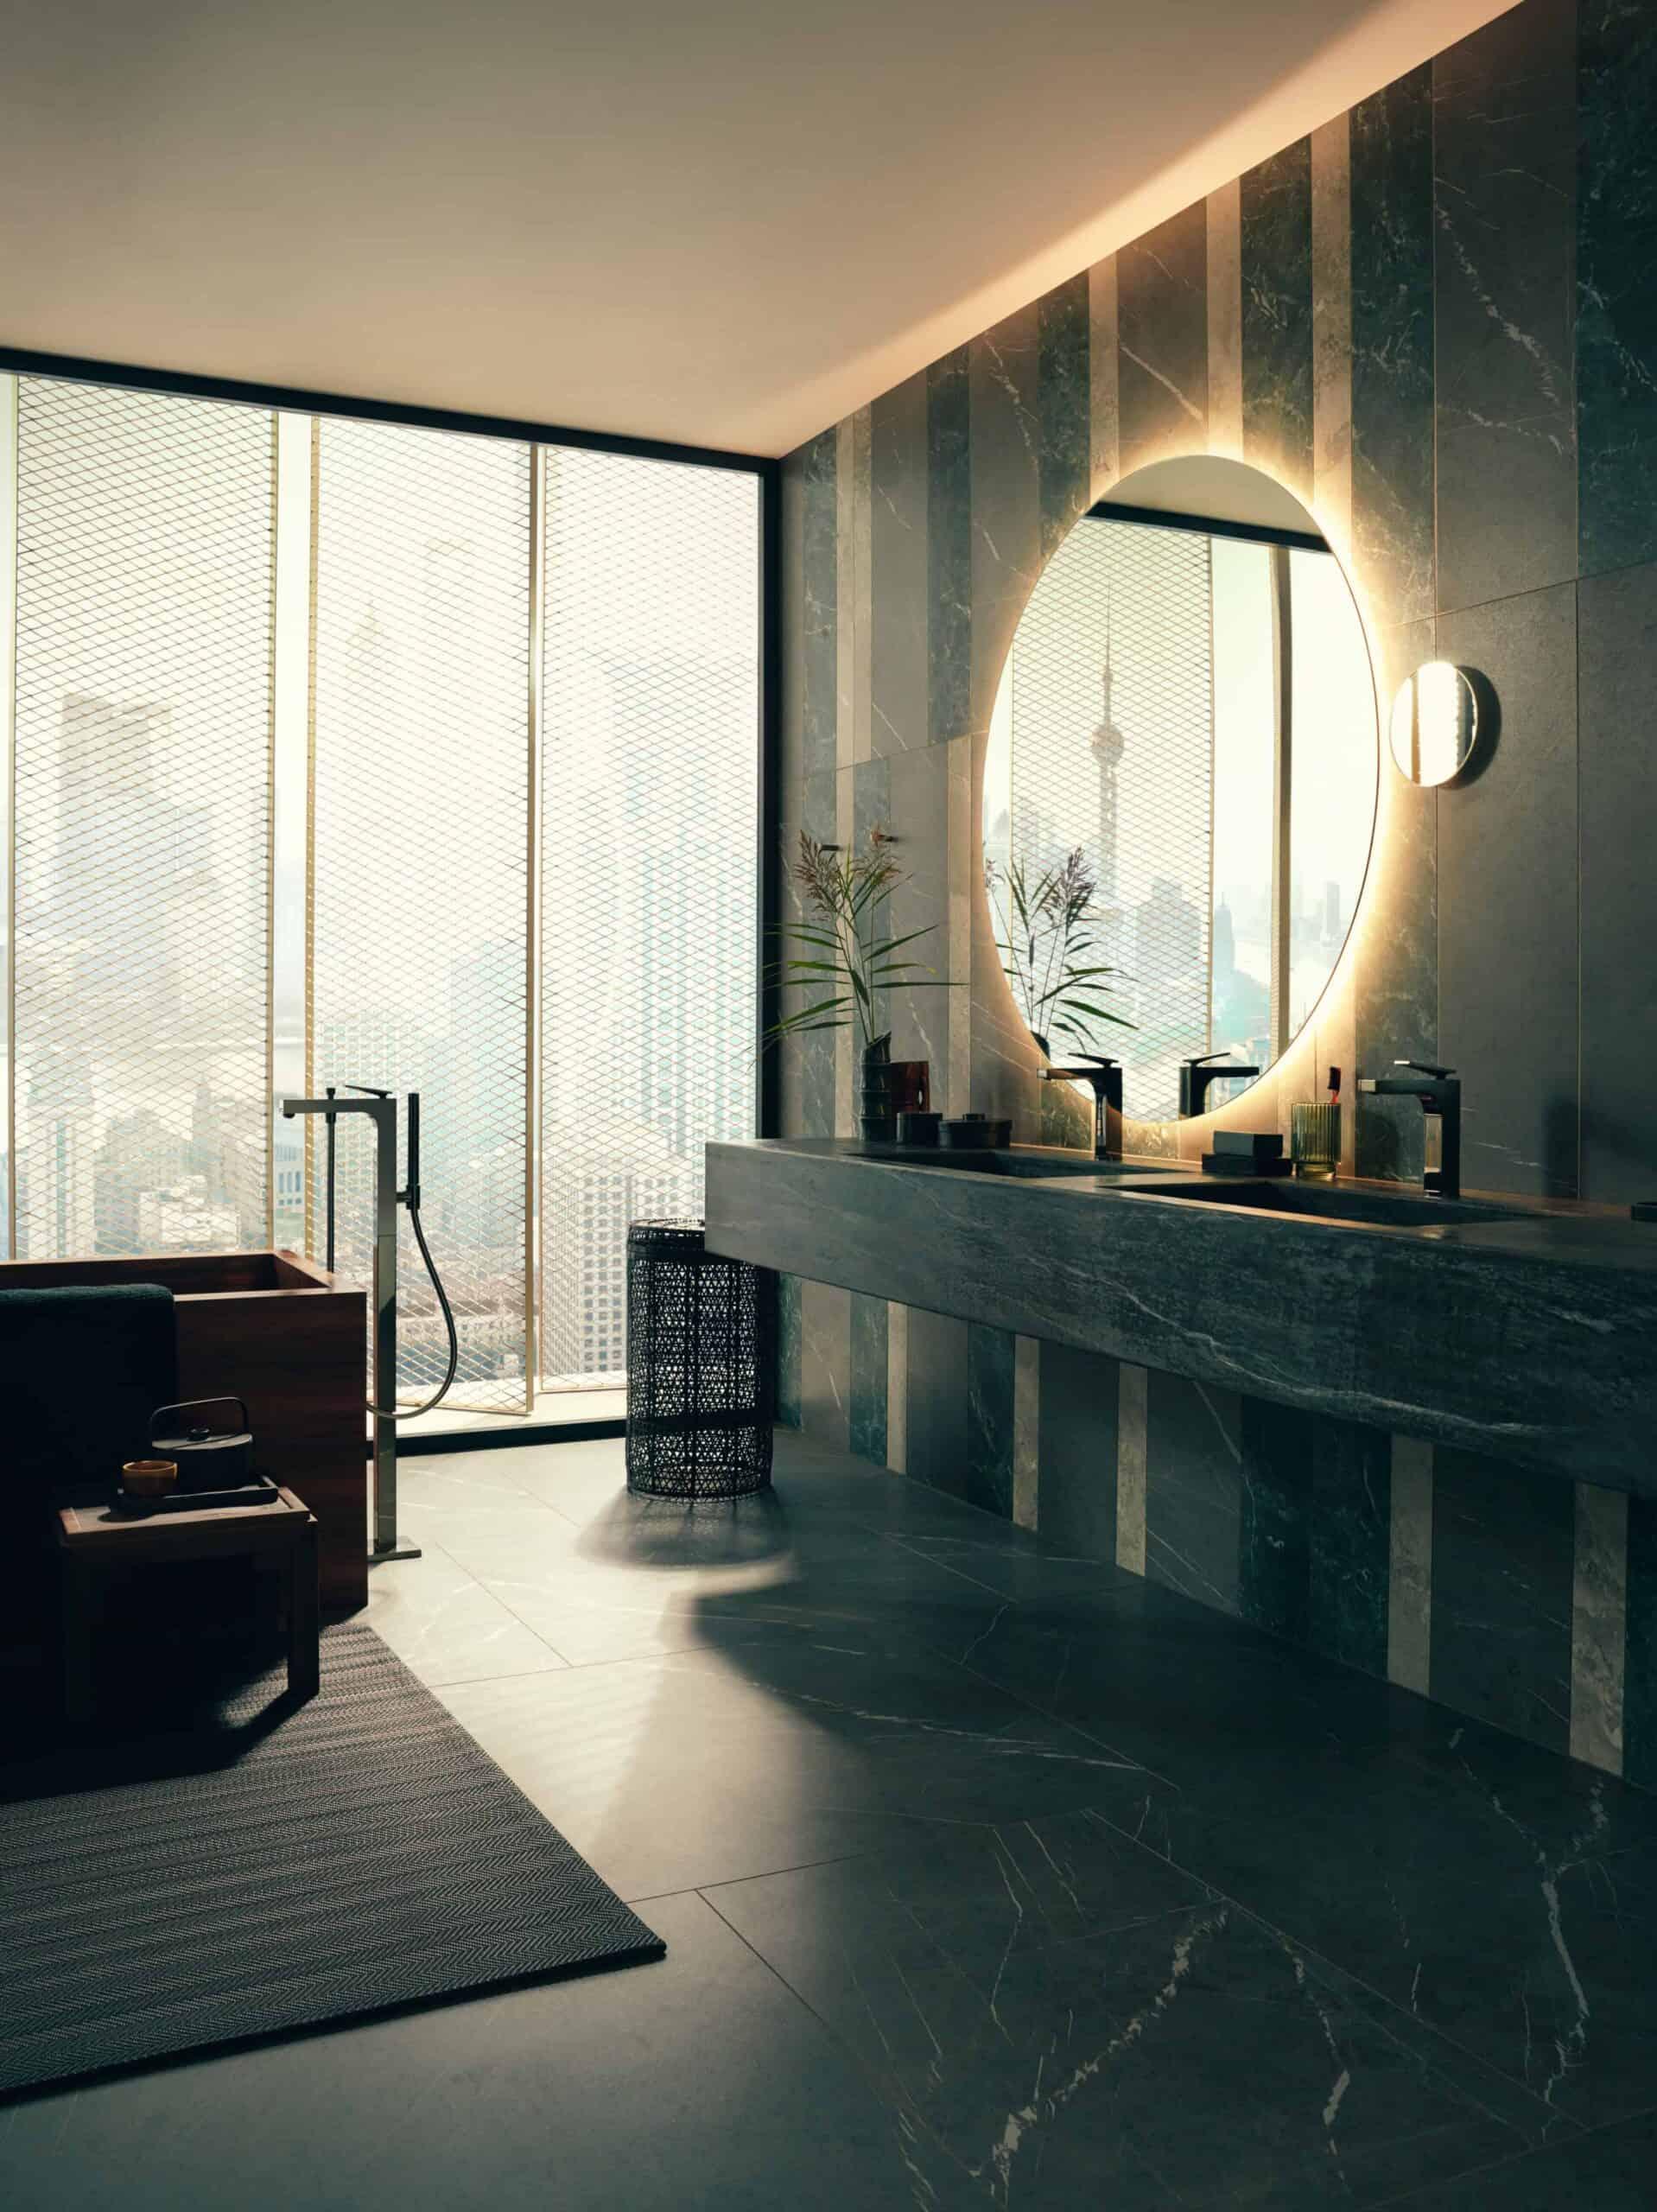 AXOR Citterio modern bathroom design collection by Hansgrohe group